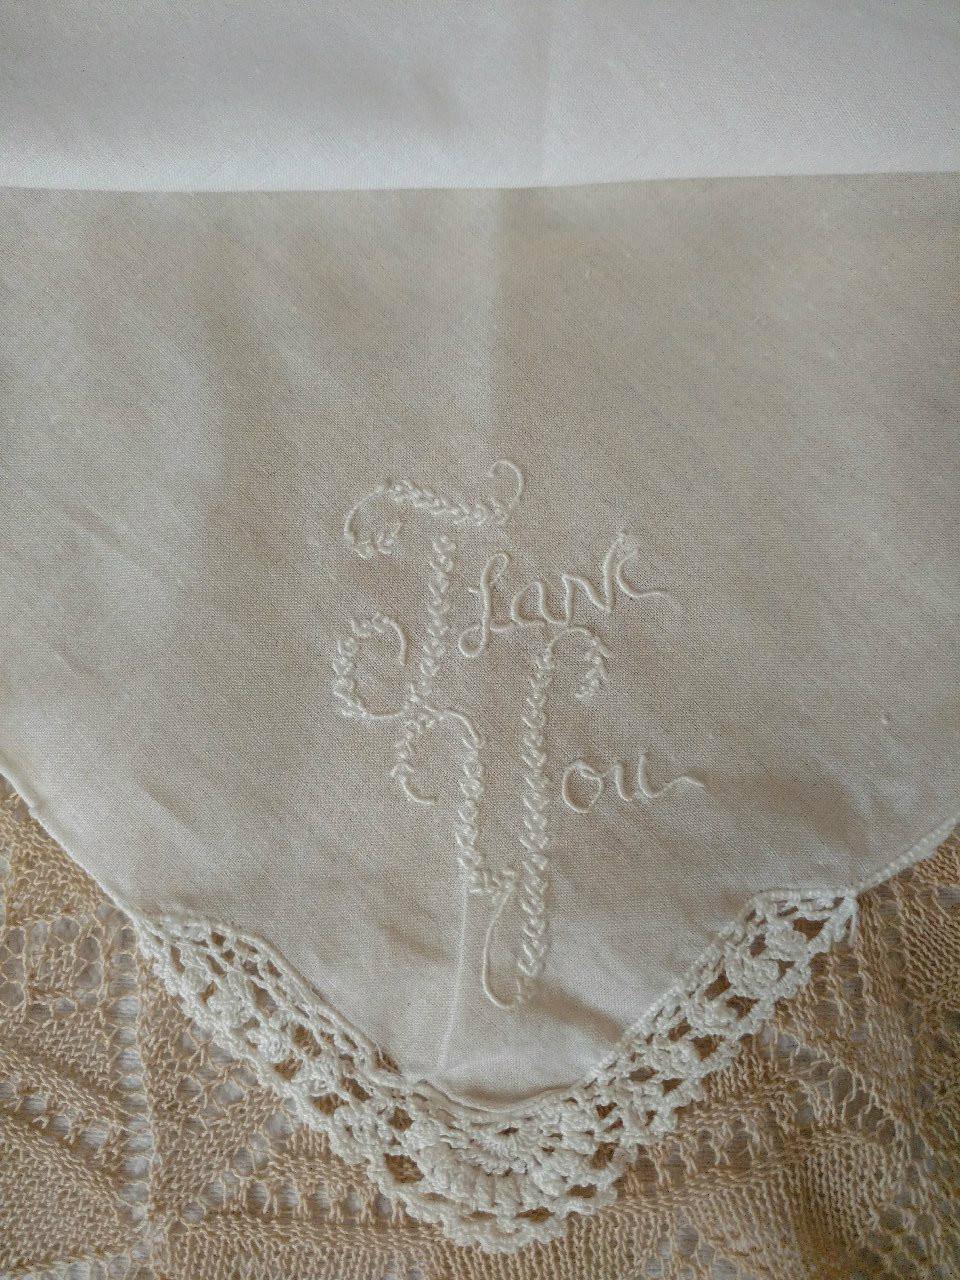 Vintage Embroidery Thank You Handkerchief Crochet Edge Corner Hankie